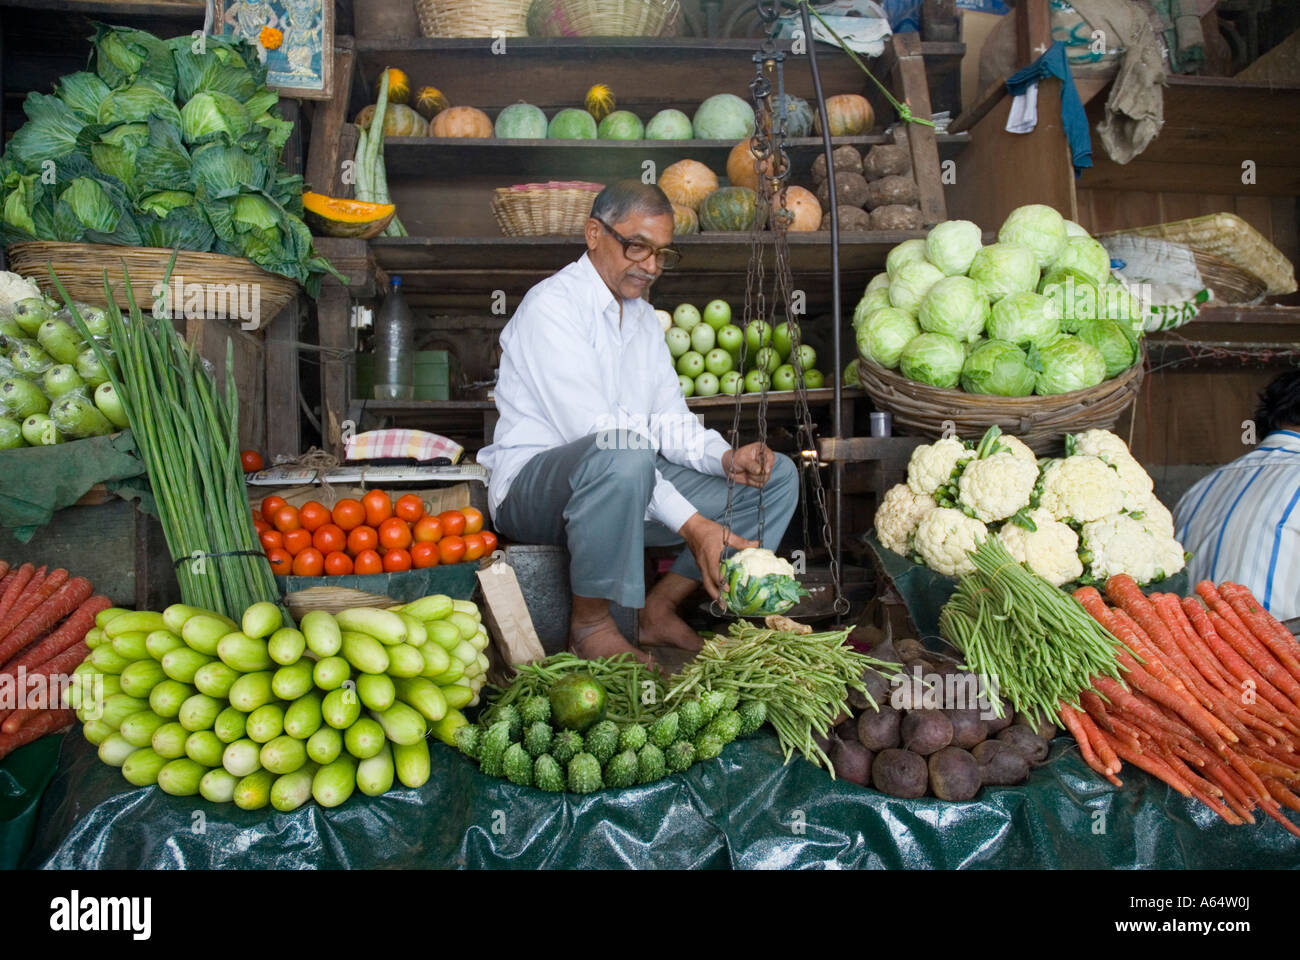 A man selling vegetables at Crawford Market in Mumbai India - Stock Image